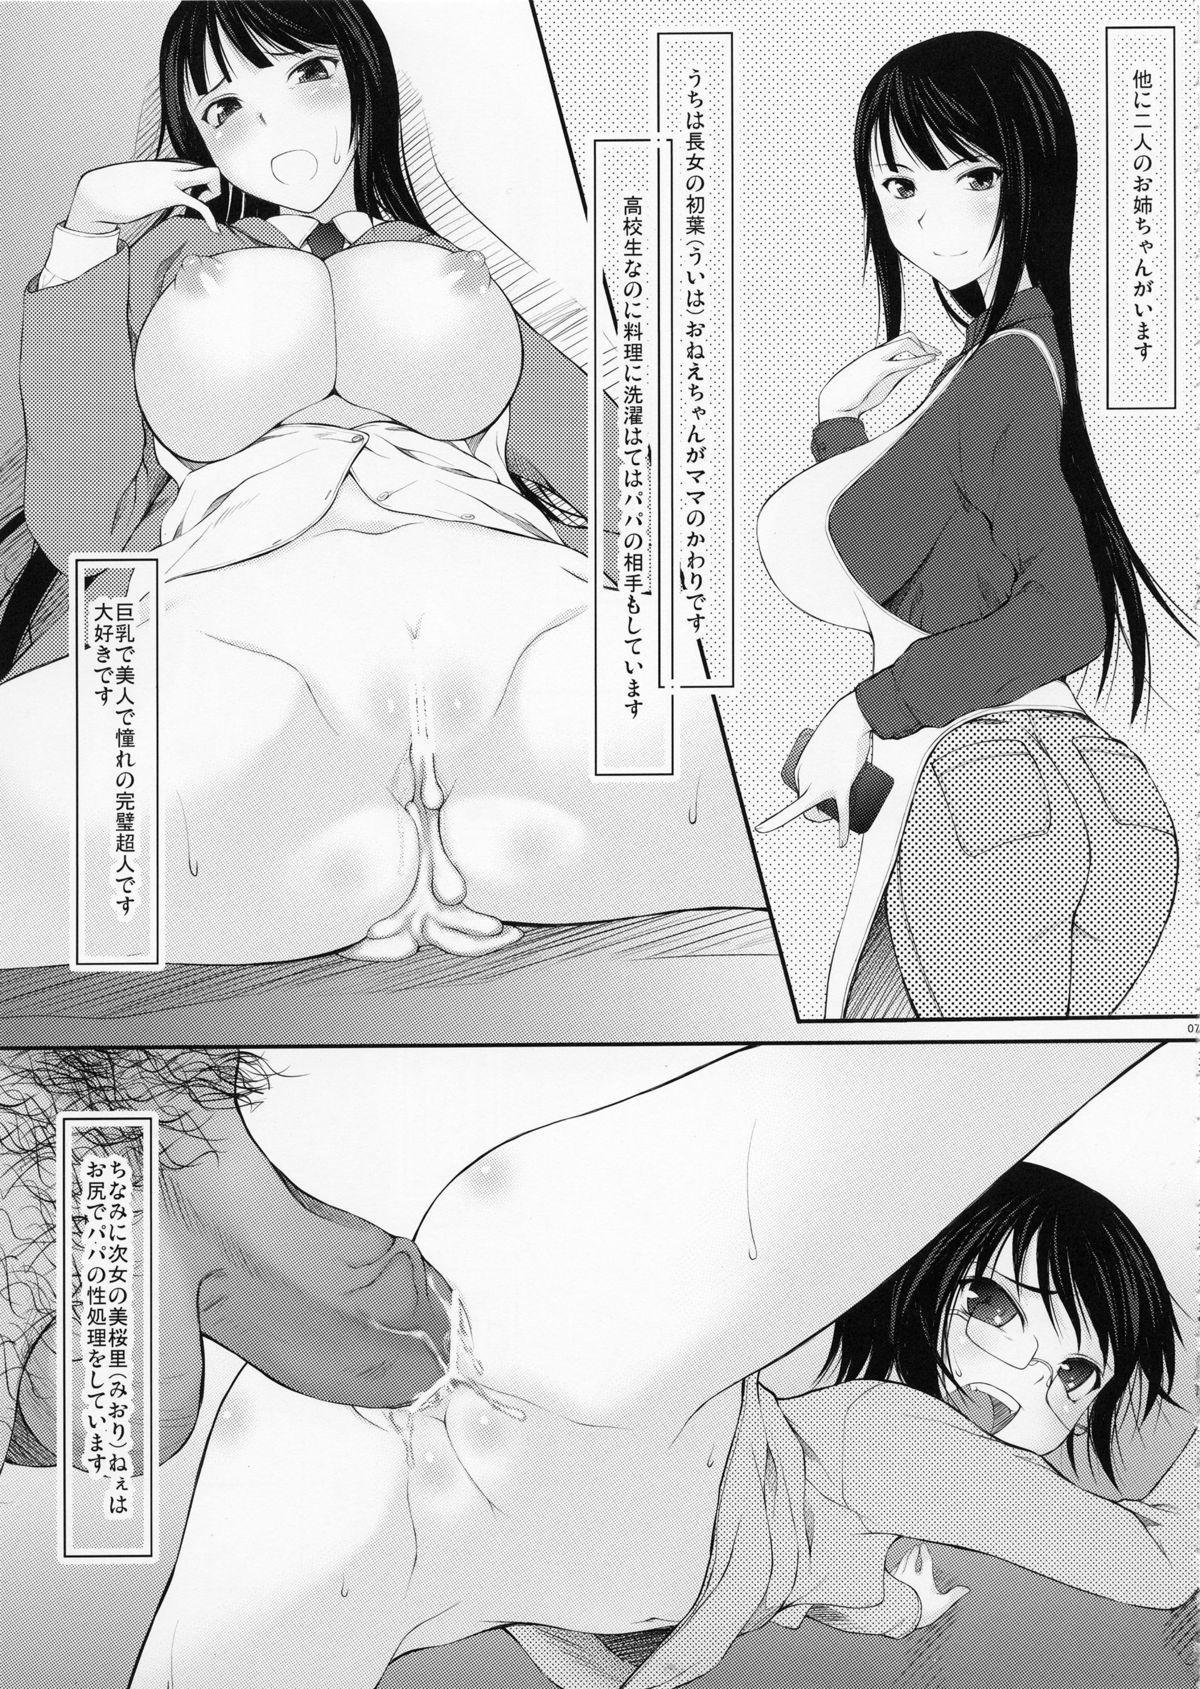 Oyako Suemusume Chichioya Kyoushuu Hen 5